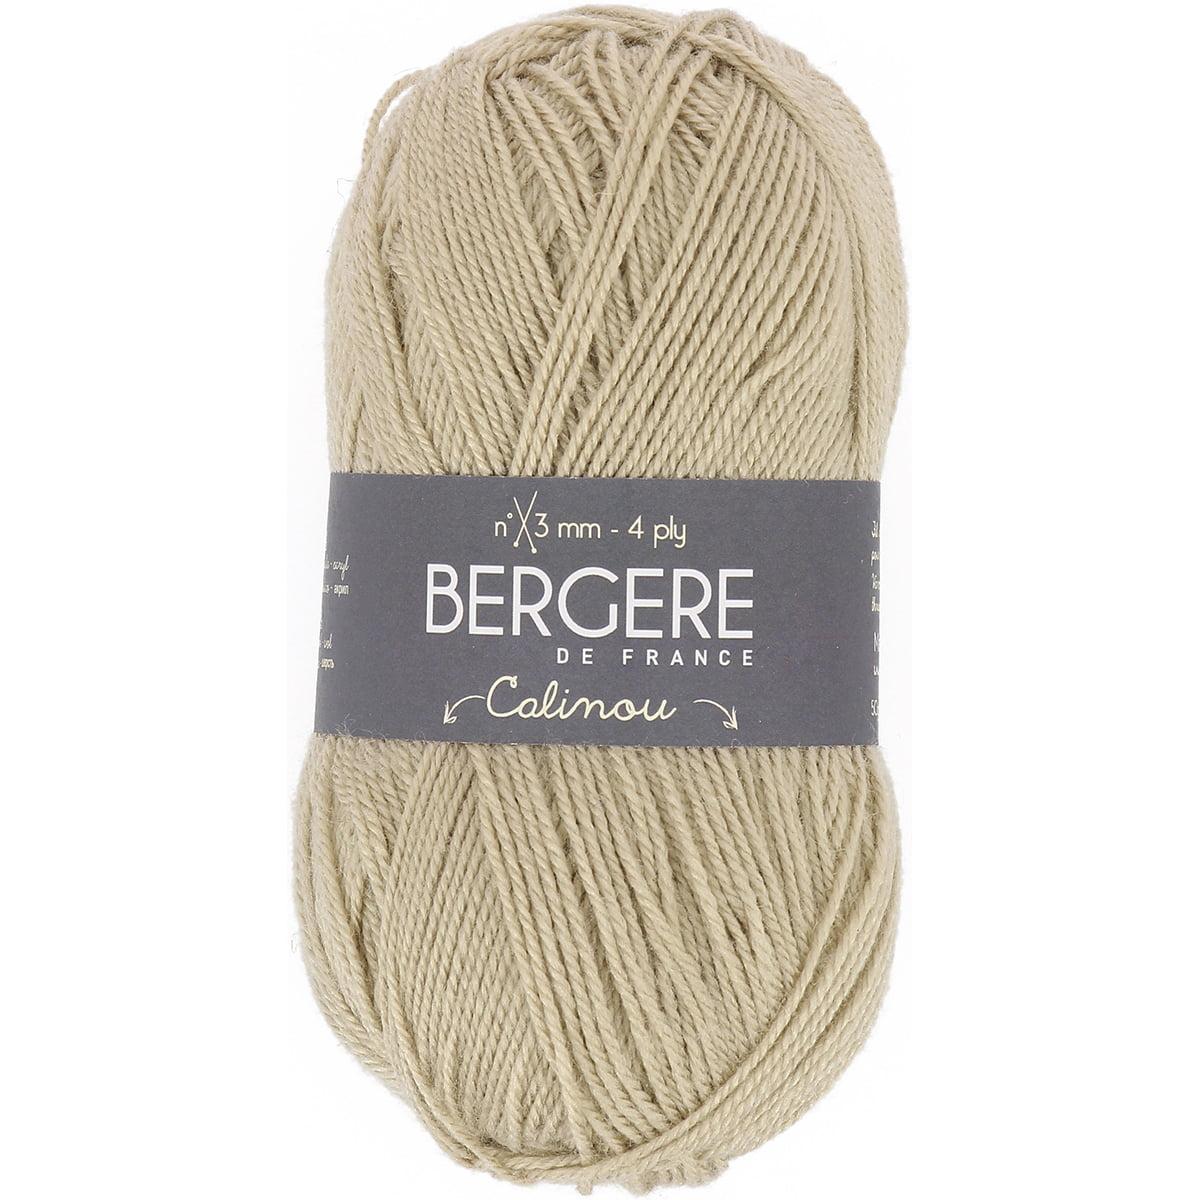 Bergere De France Calinou Yarn-Chanvre - image 1 of 1